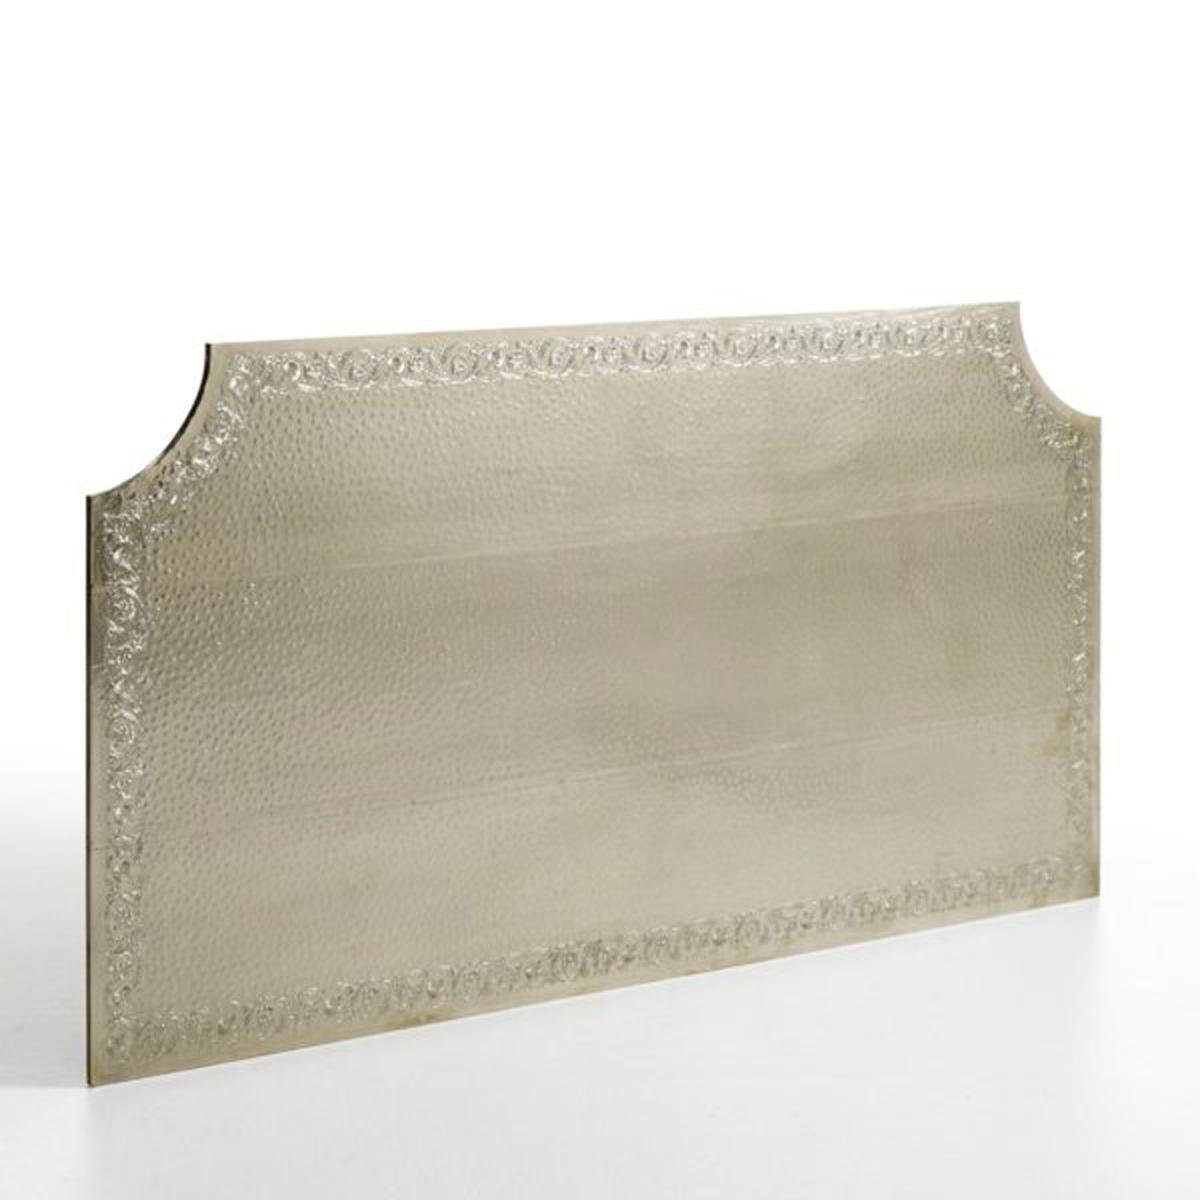 "Kopfteil \""Parvani\"", gehärtetes Metall, H. 100 cm"